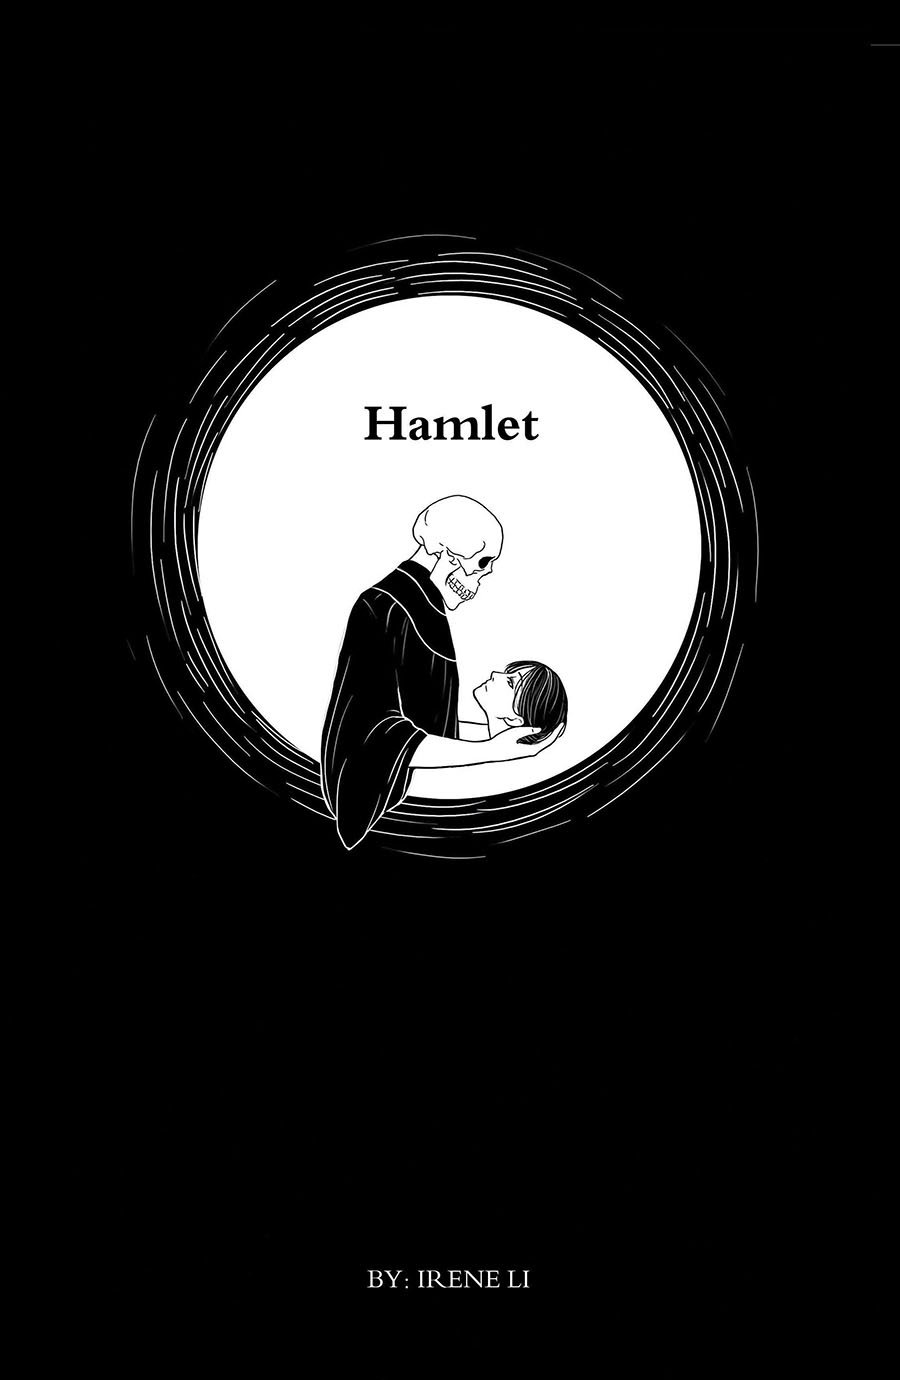 hamletcover.jpg